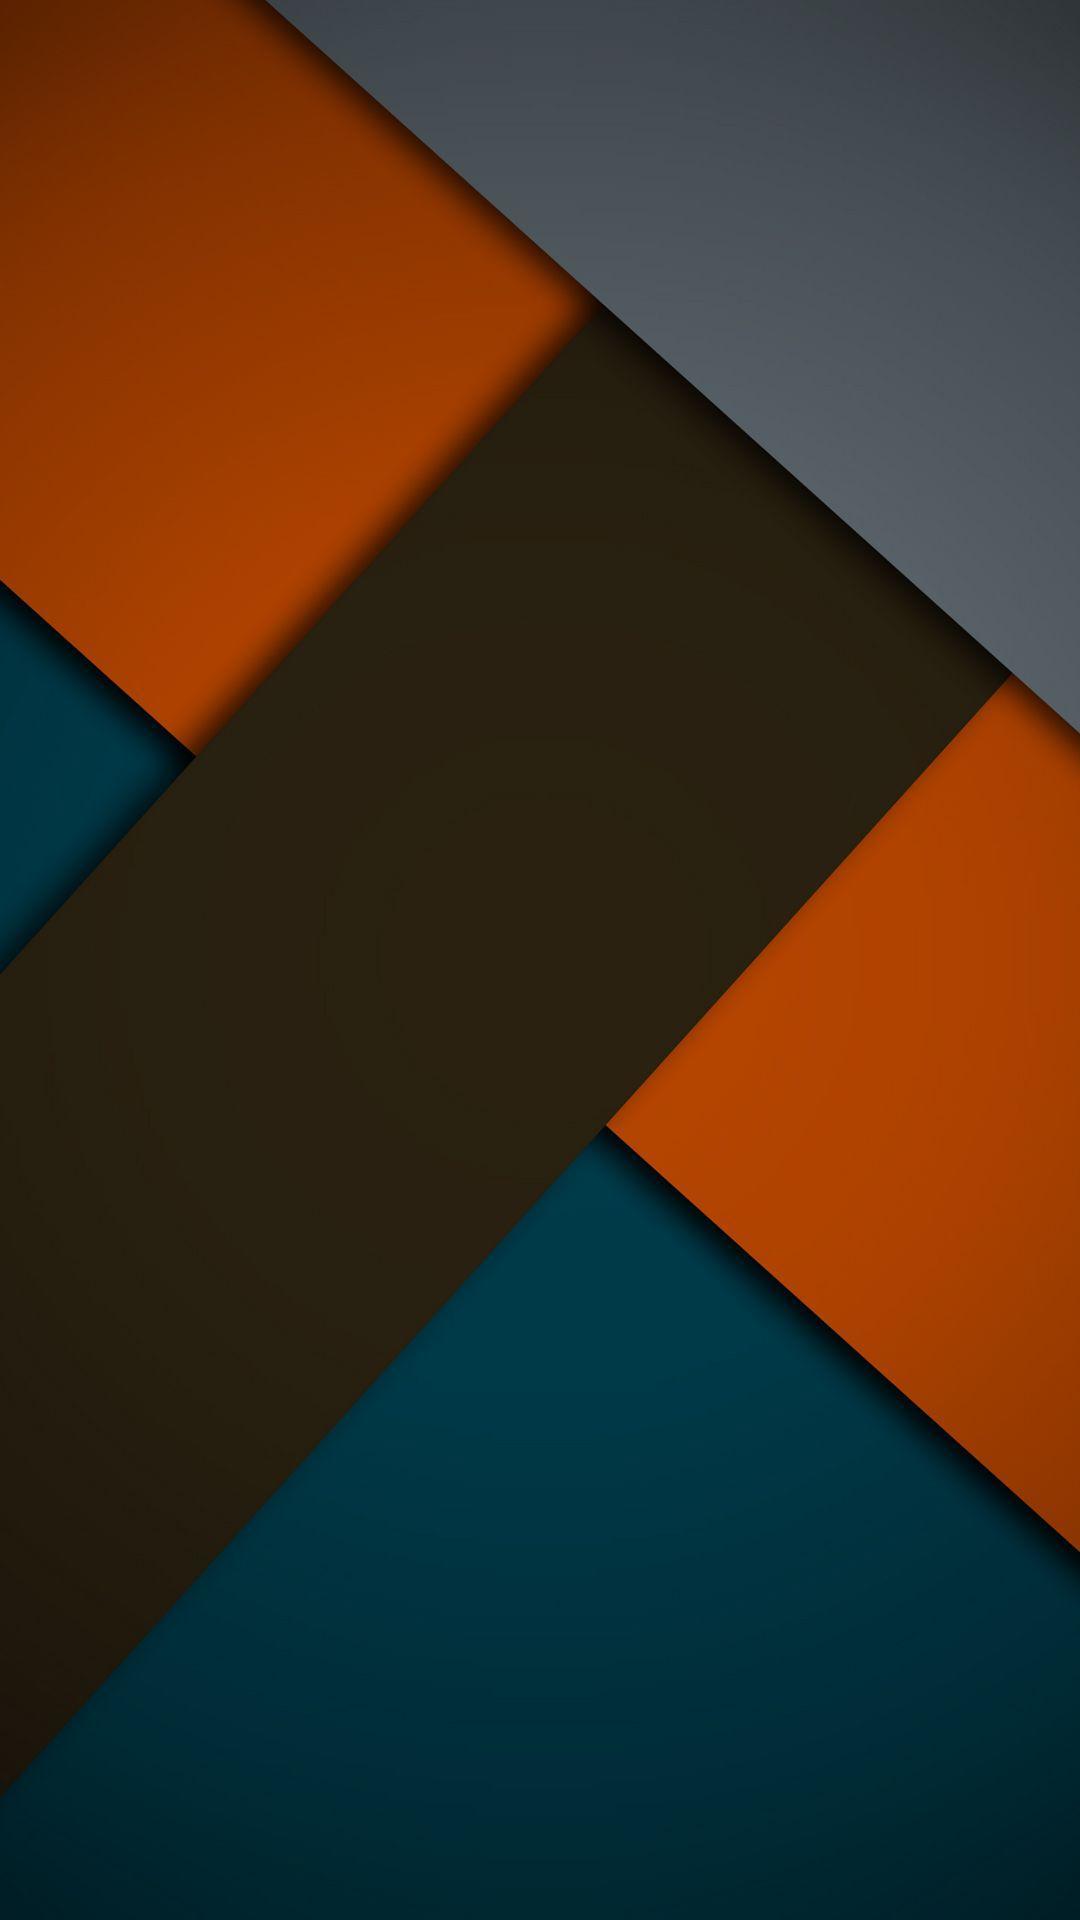 Modern phone wallpapers top free modern phone - Material design mobile wallpaper ...